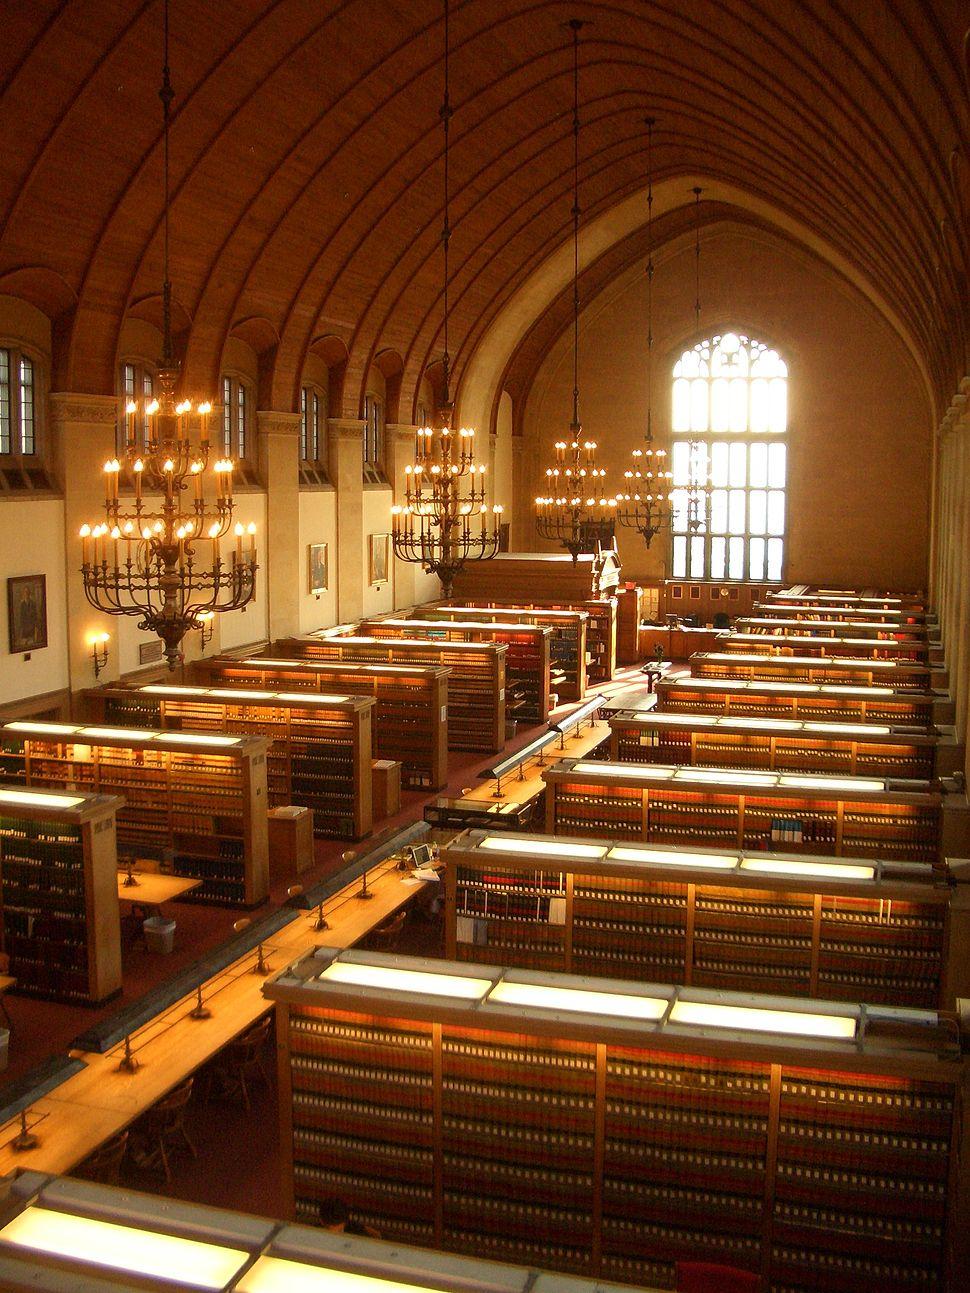 Cornell Law School Library